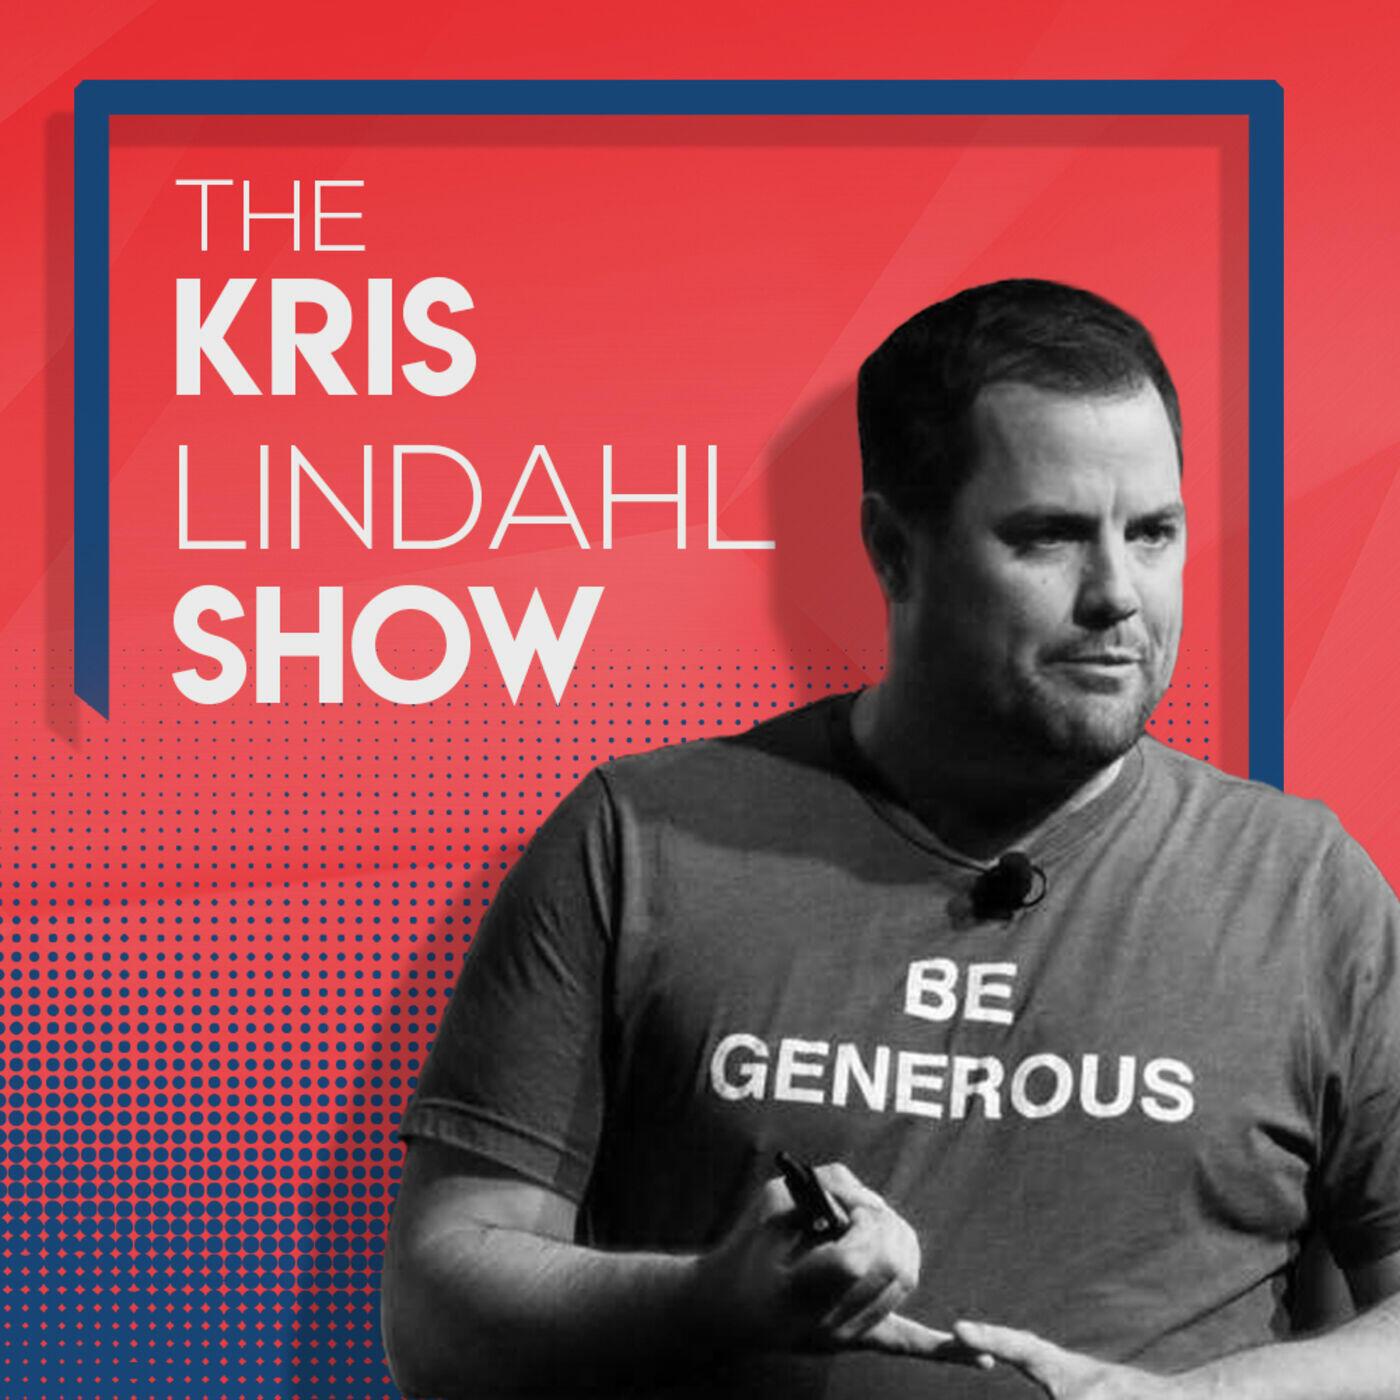 The Kris Lindahl Show